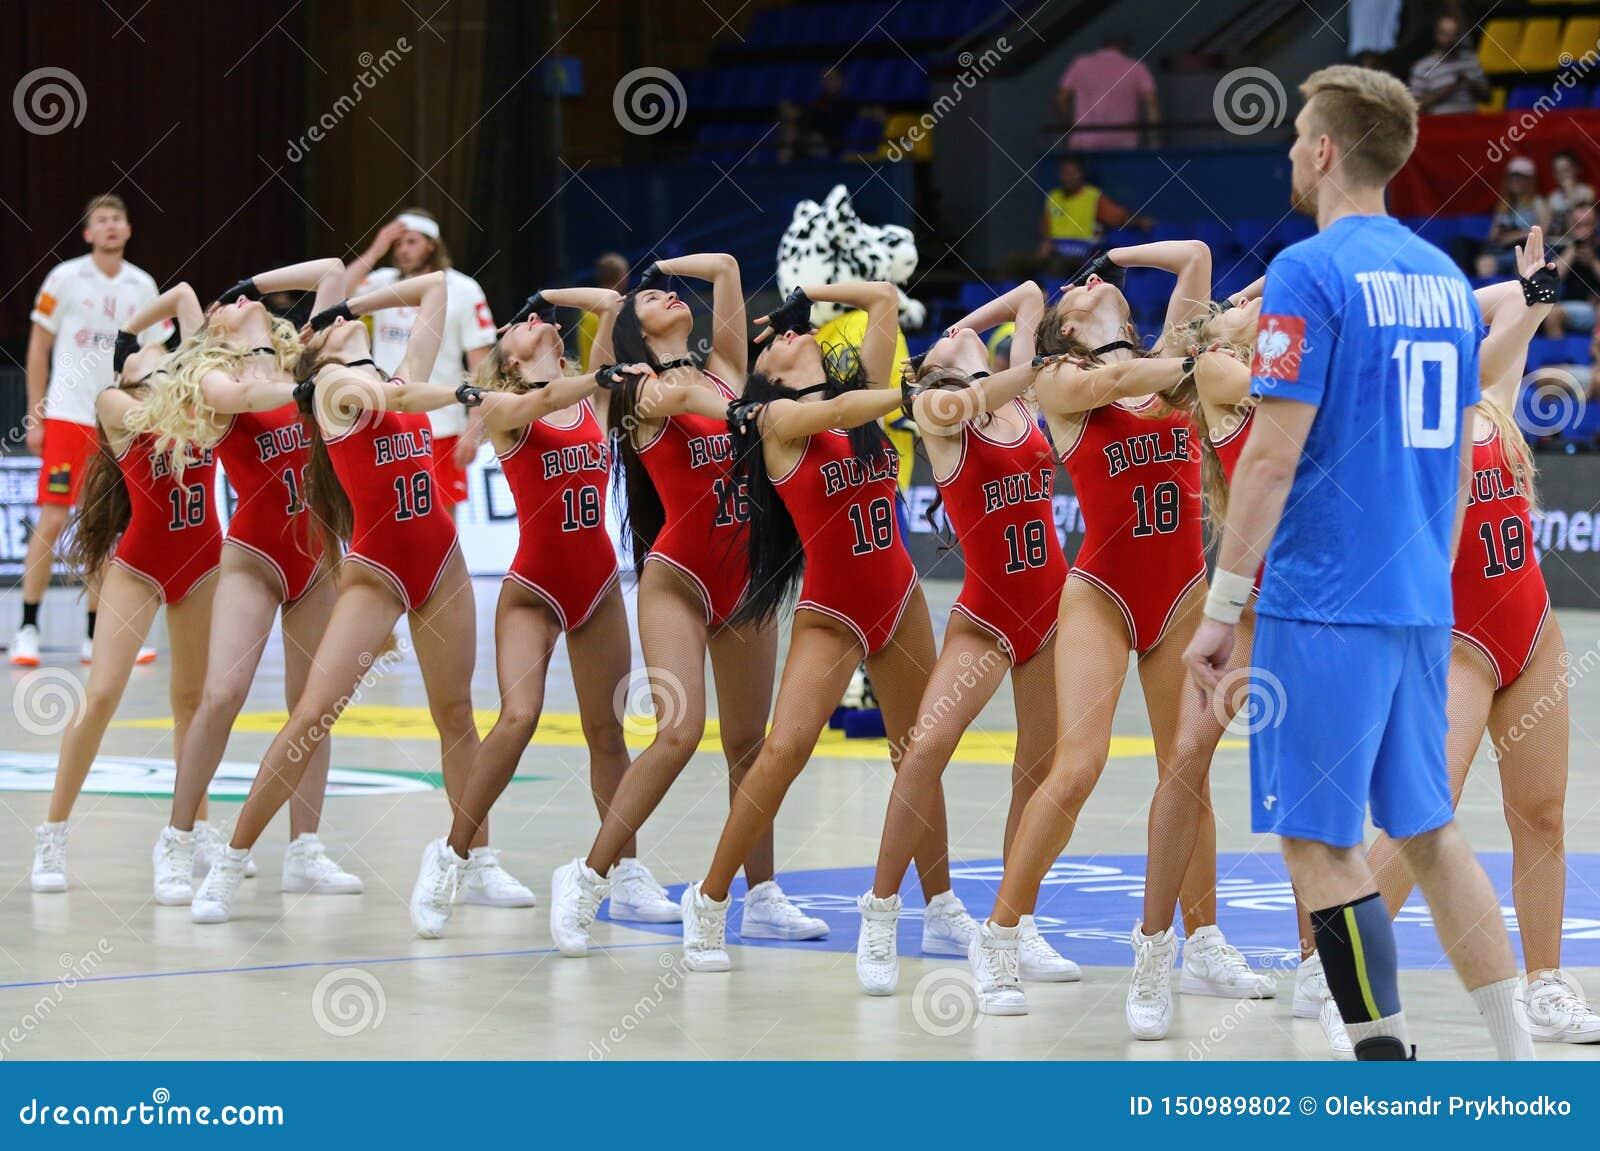 Ehf Euro 2020 Qualifiers Handball Game Ukraine V Denmark